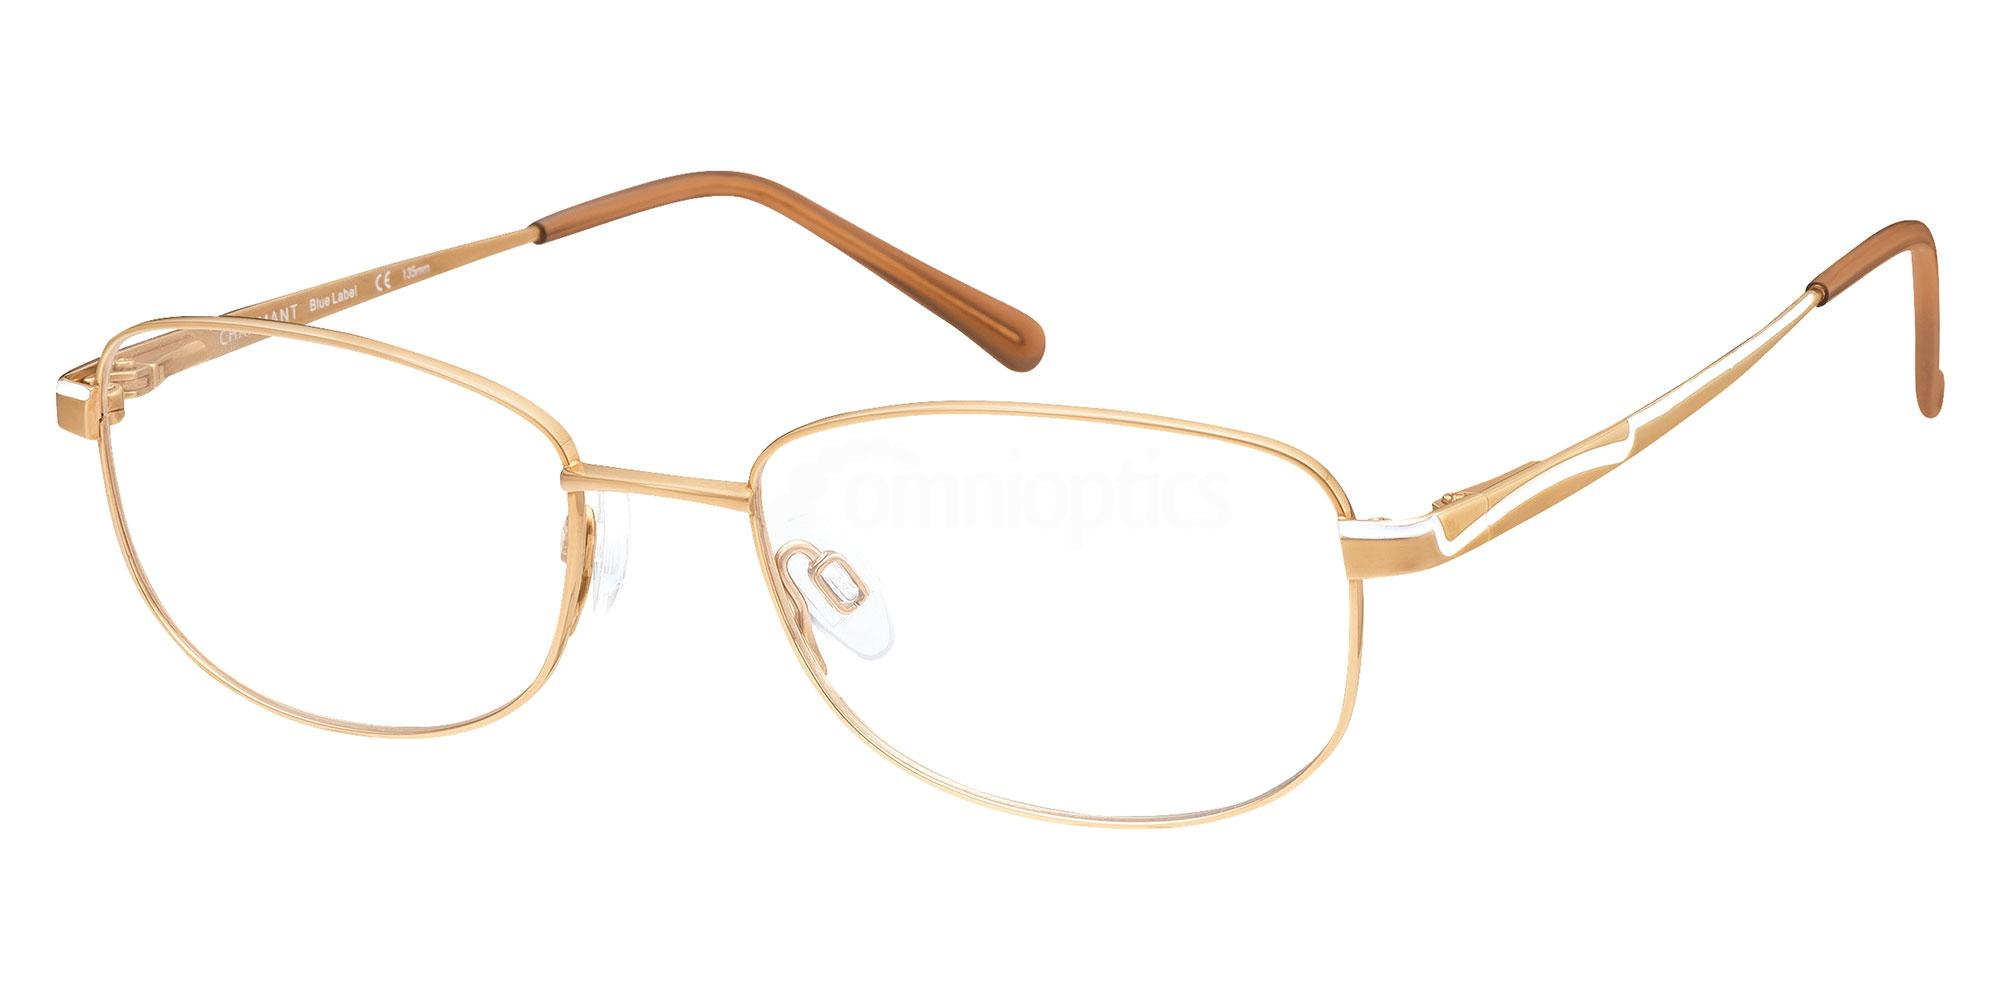 GP CH16038 Glasses, Charmant Blue Label